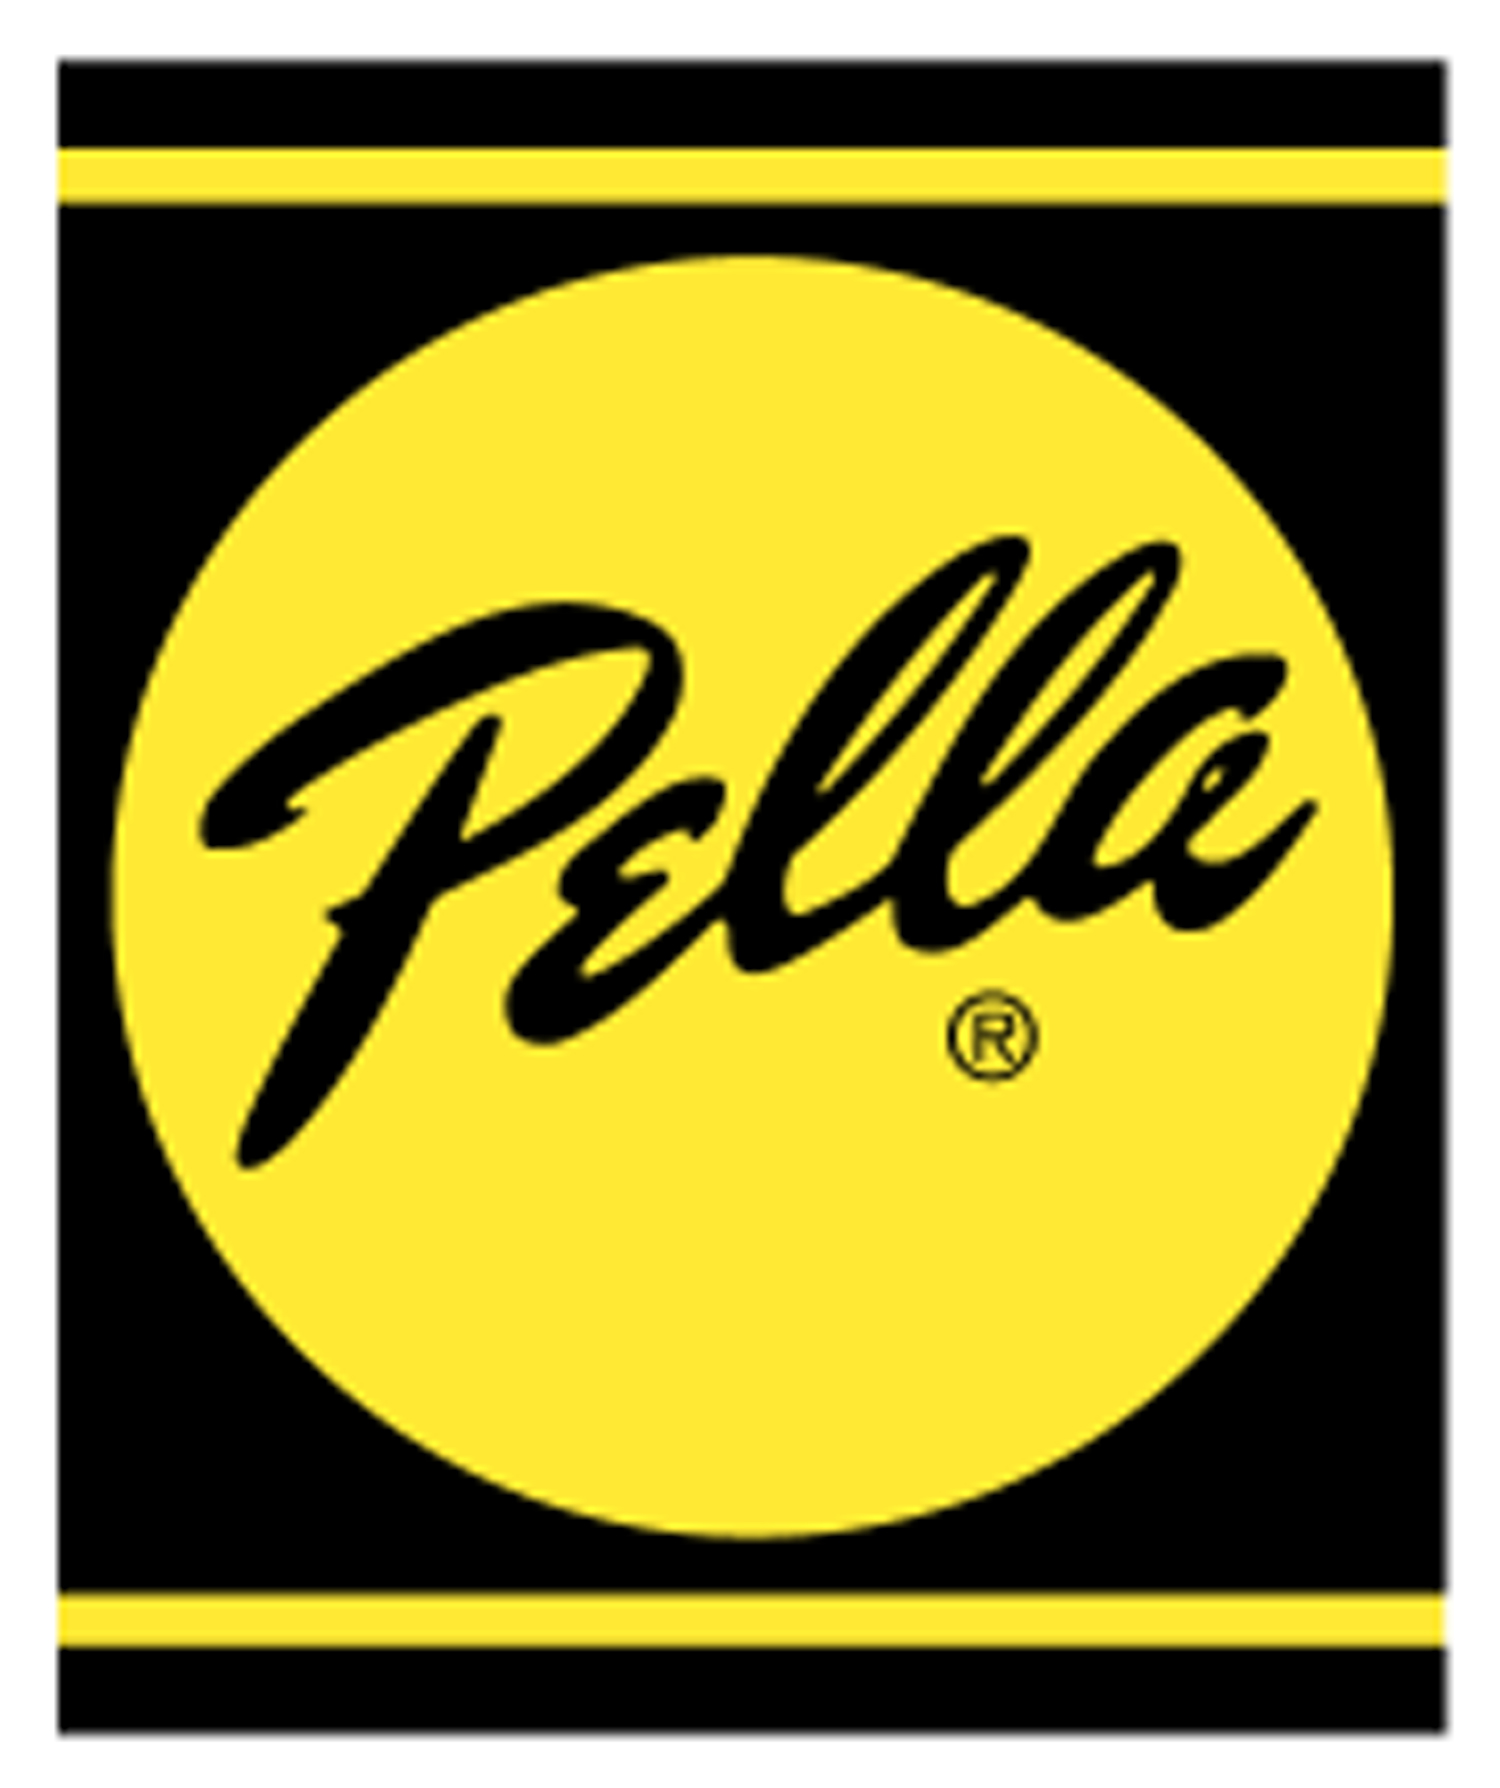 pella-logo_c300.jpg